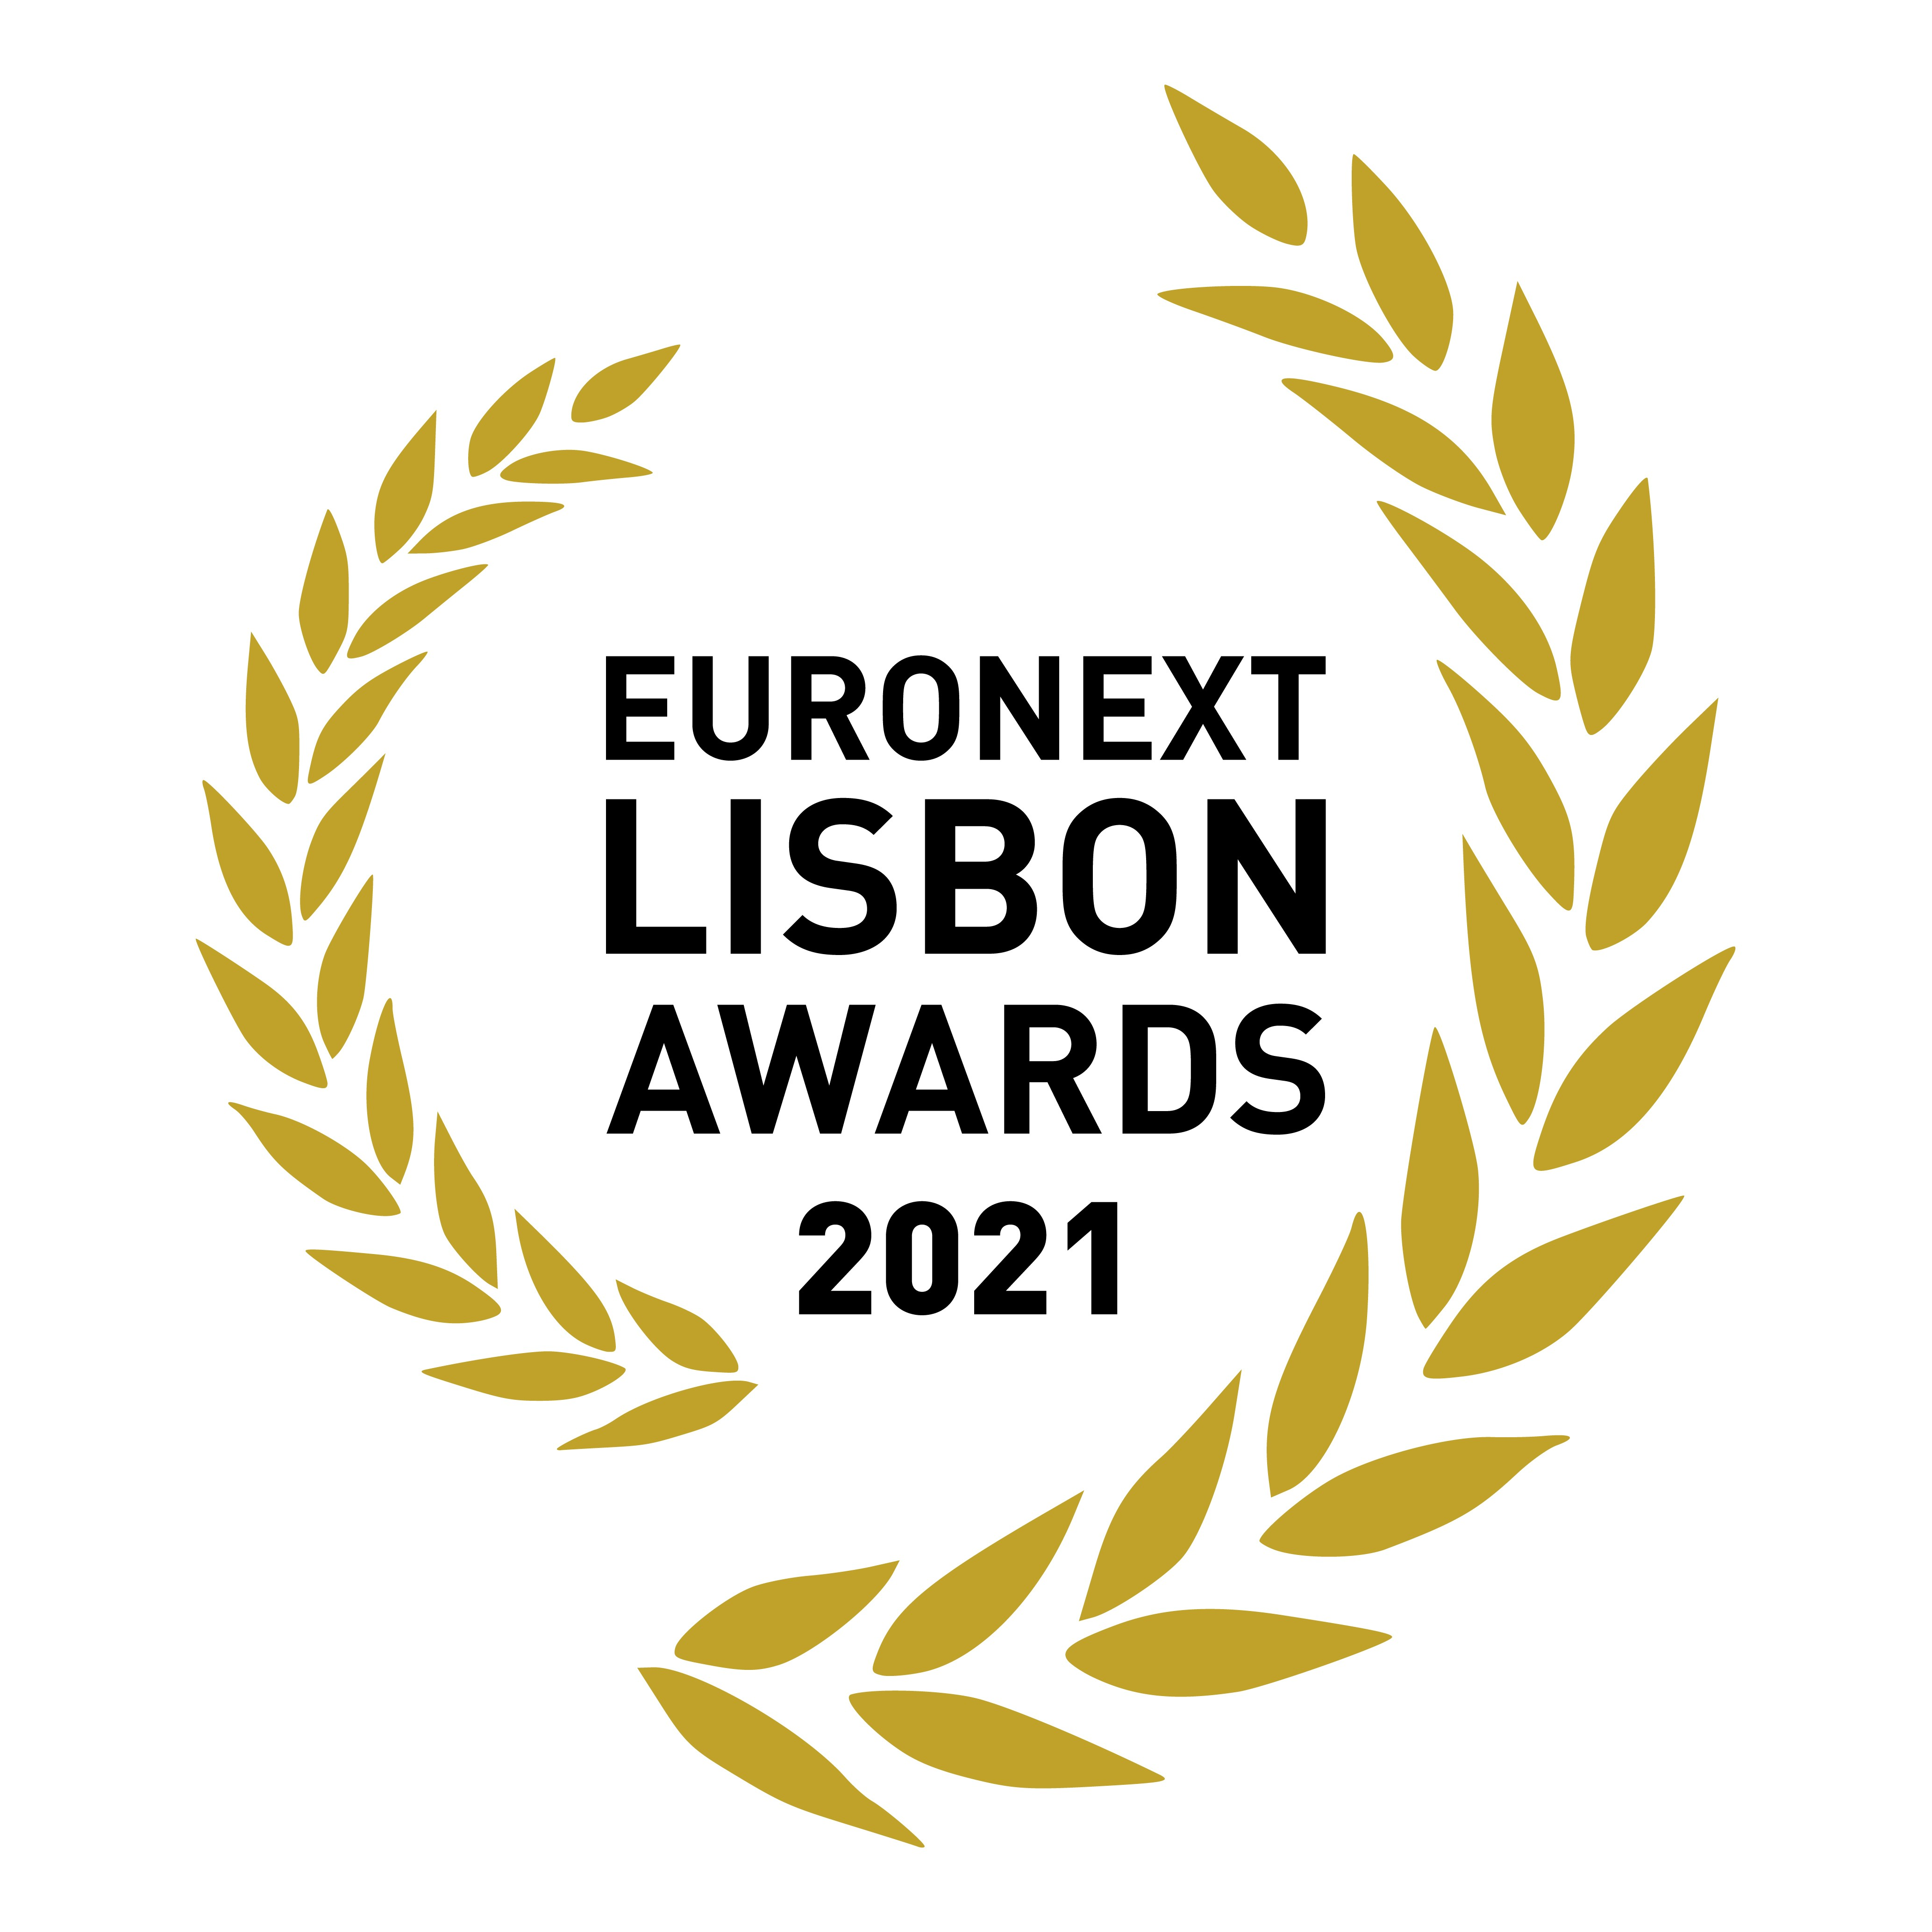 euronext-lisbon-awards-digital-black-qqvniseb.jpg